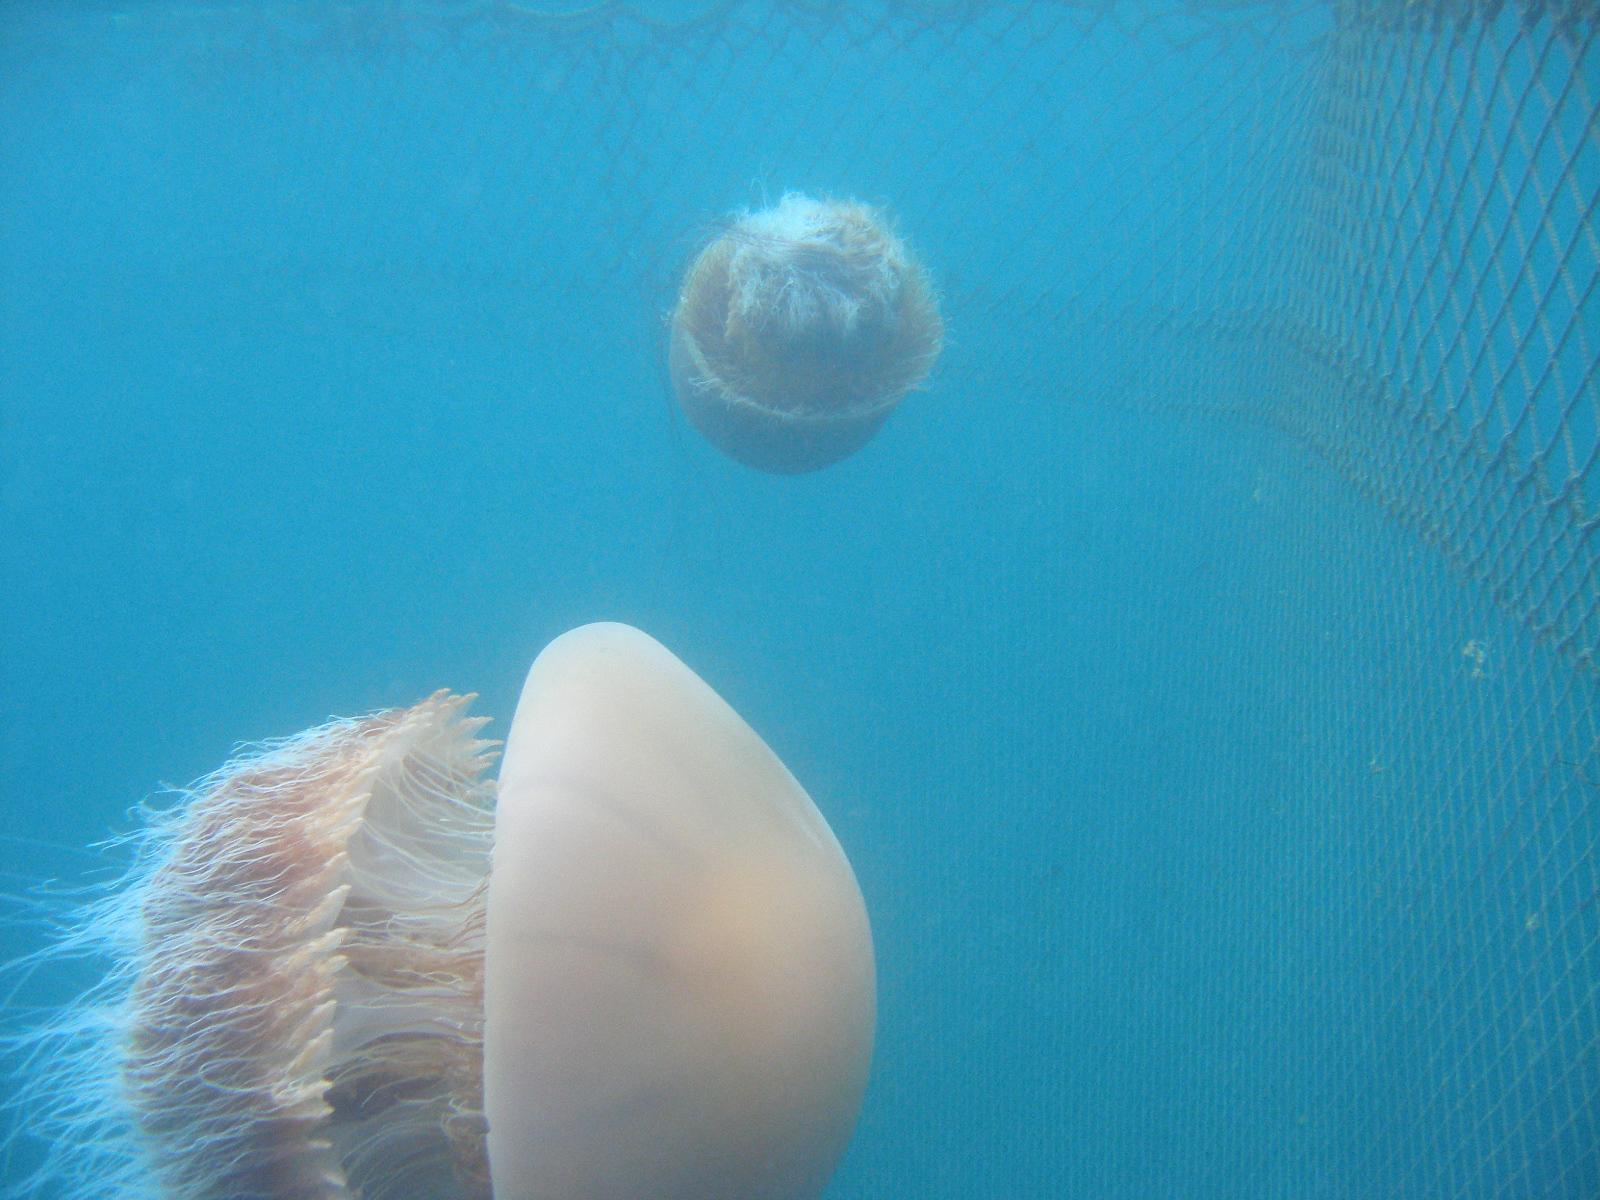 Jellyfish Research Laboratories, Inc